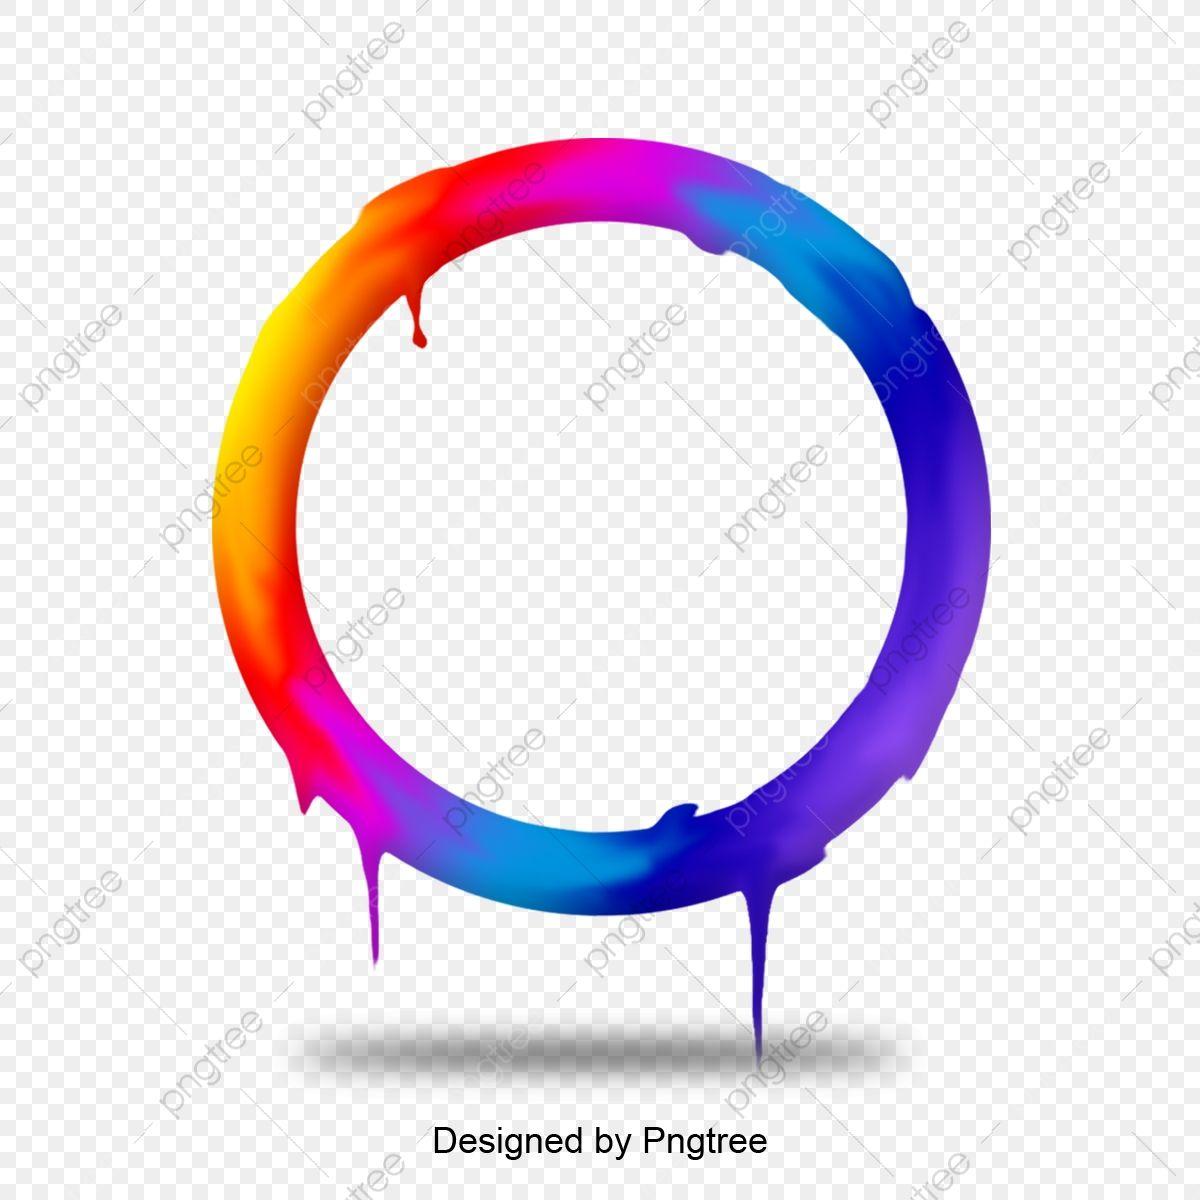 Paint Color Circles Paint Clipart Color Clipart Circles Png Transparent Clipart Image And Psd File F Frames Design Graphic Color Circle Geometric Background